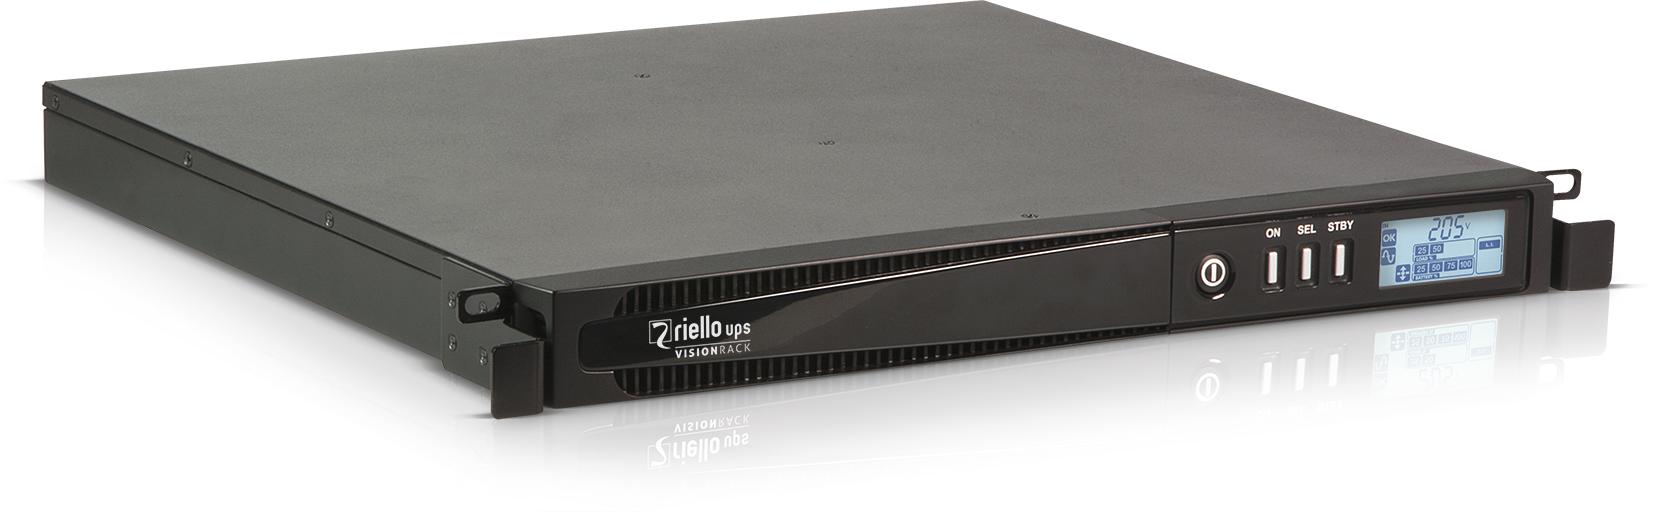 iDialog Rack IDR 1200